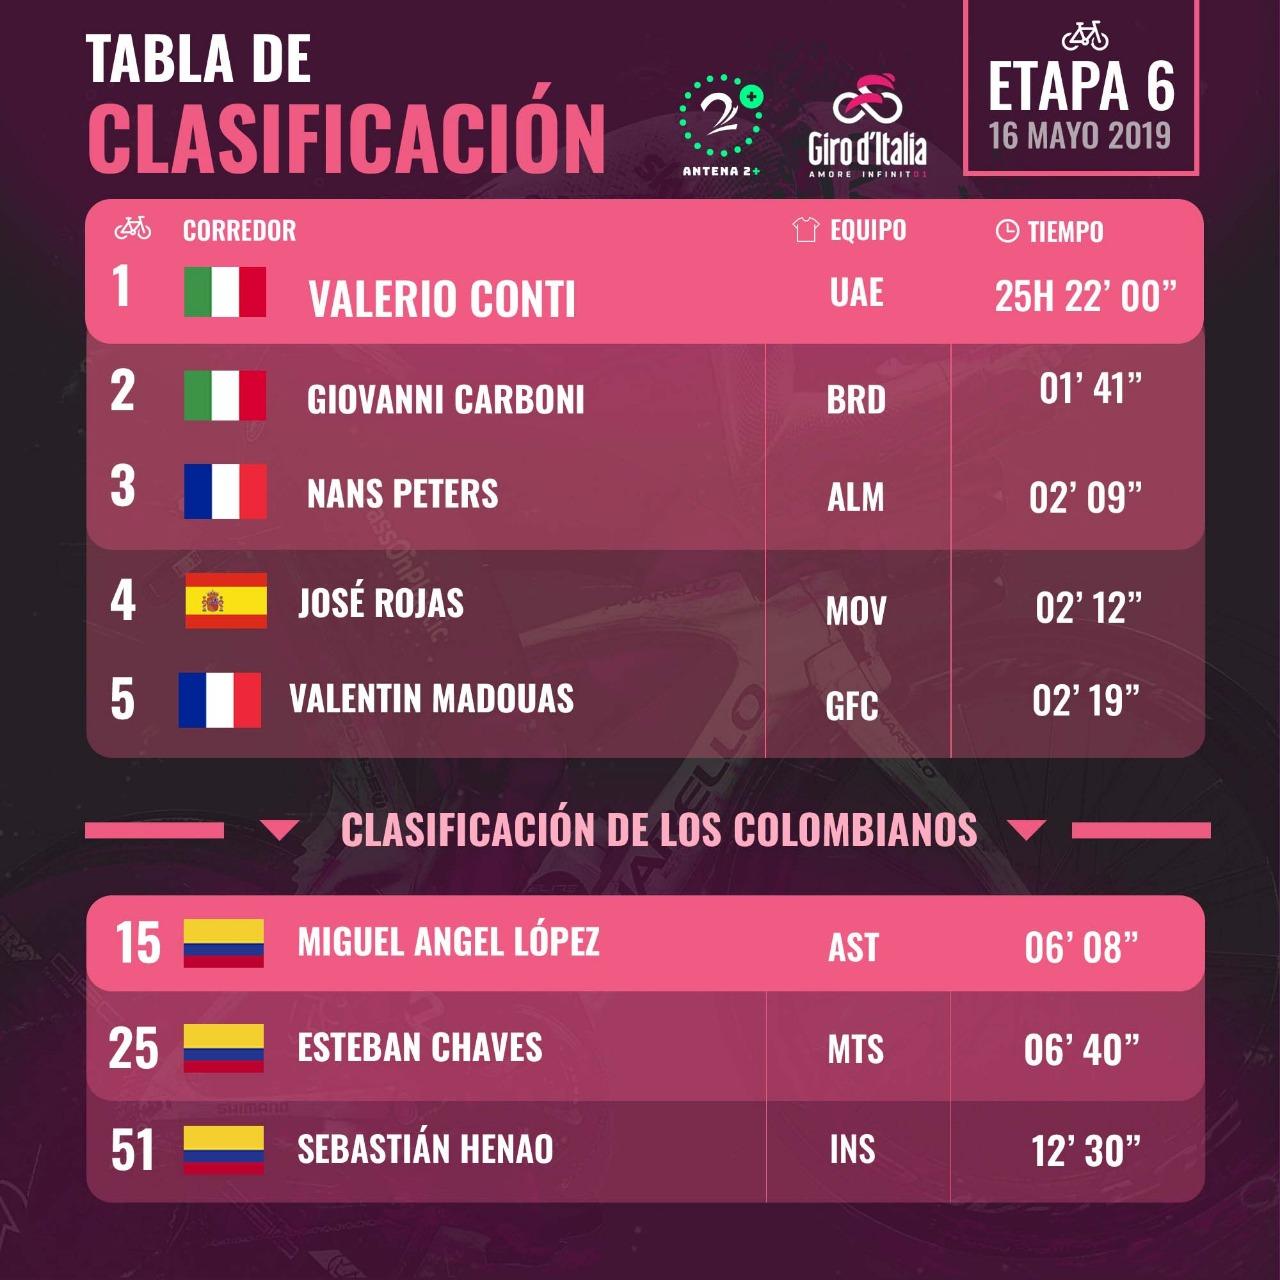 Clasificación del Giro de Italia, tras la 6 etapa